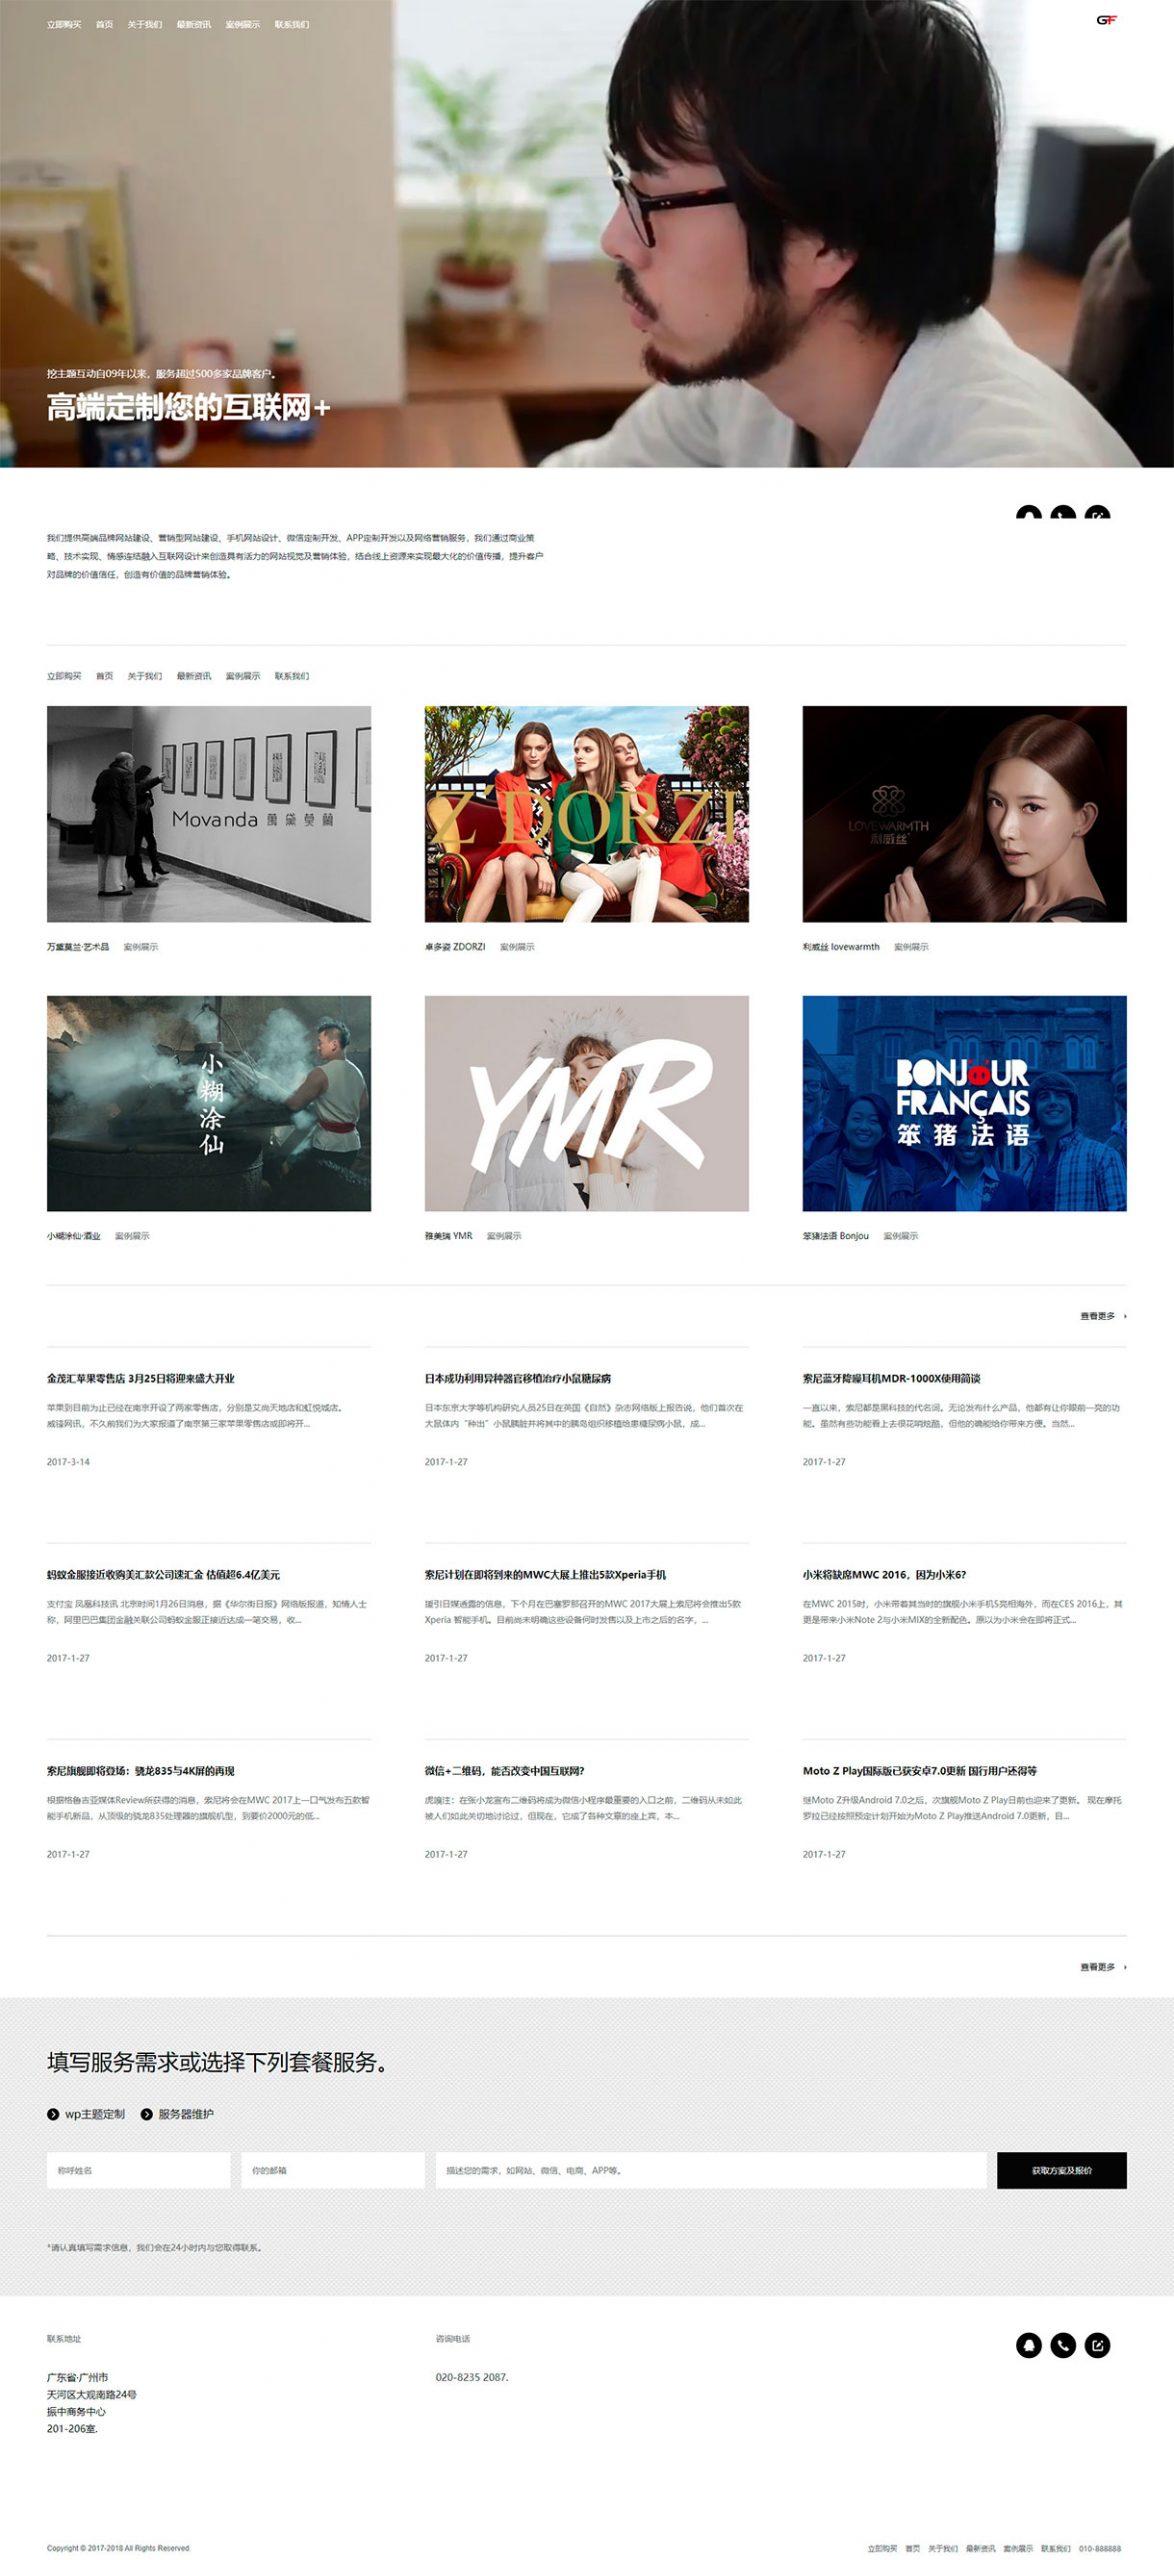 XL-028.响应式网络科技设计工作室企业网站